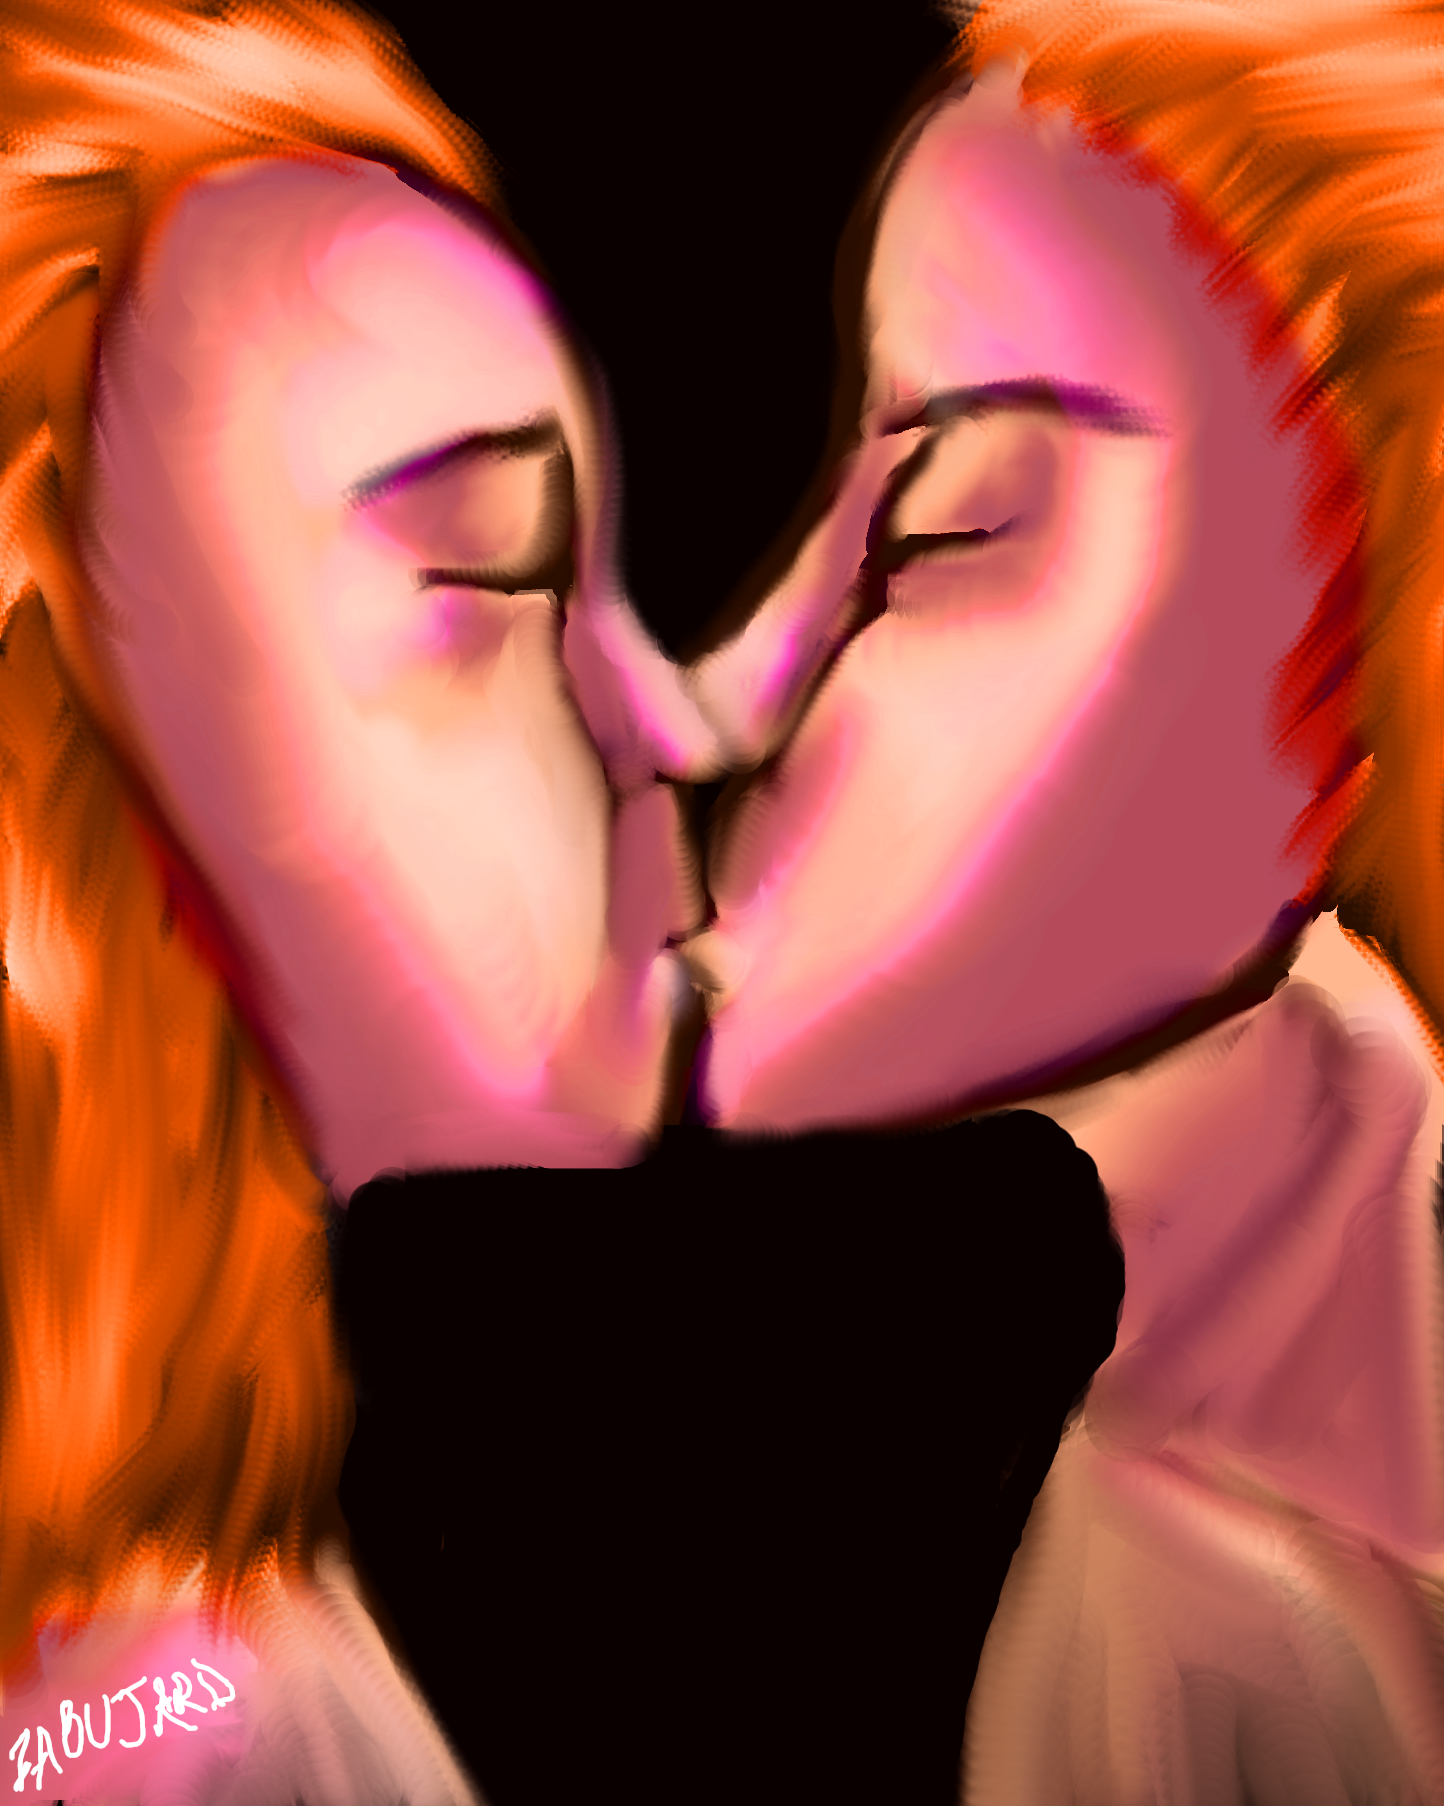 fantasy kiss